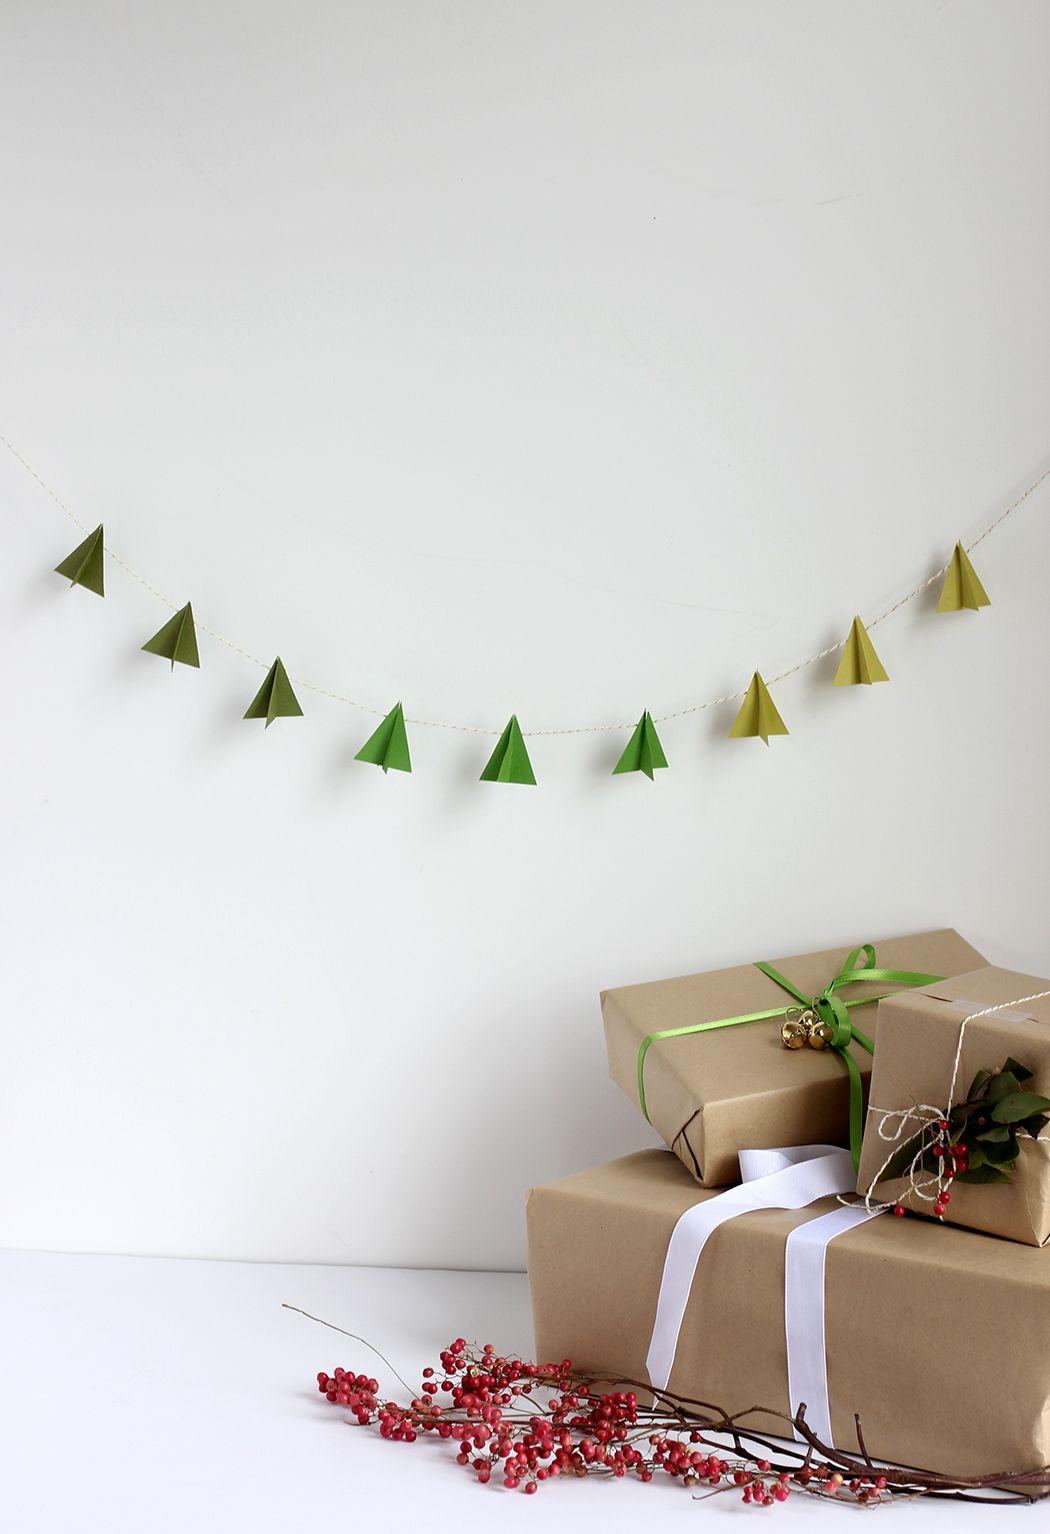 Diy Paper Tree Garland Diy Christmas Tree Garland Christmas Decor Diy Diy Christmas Garland